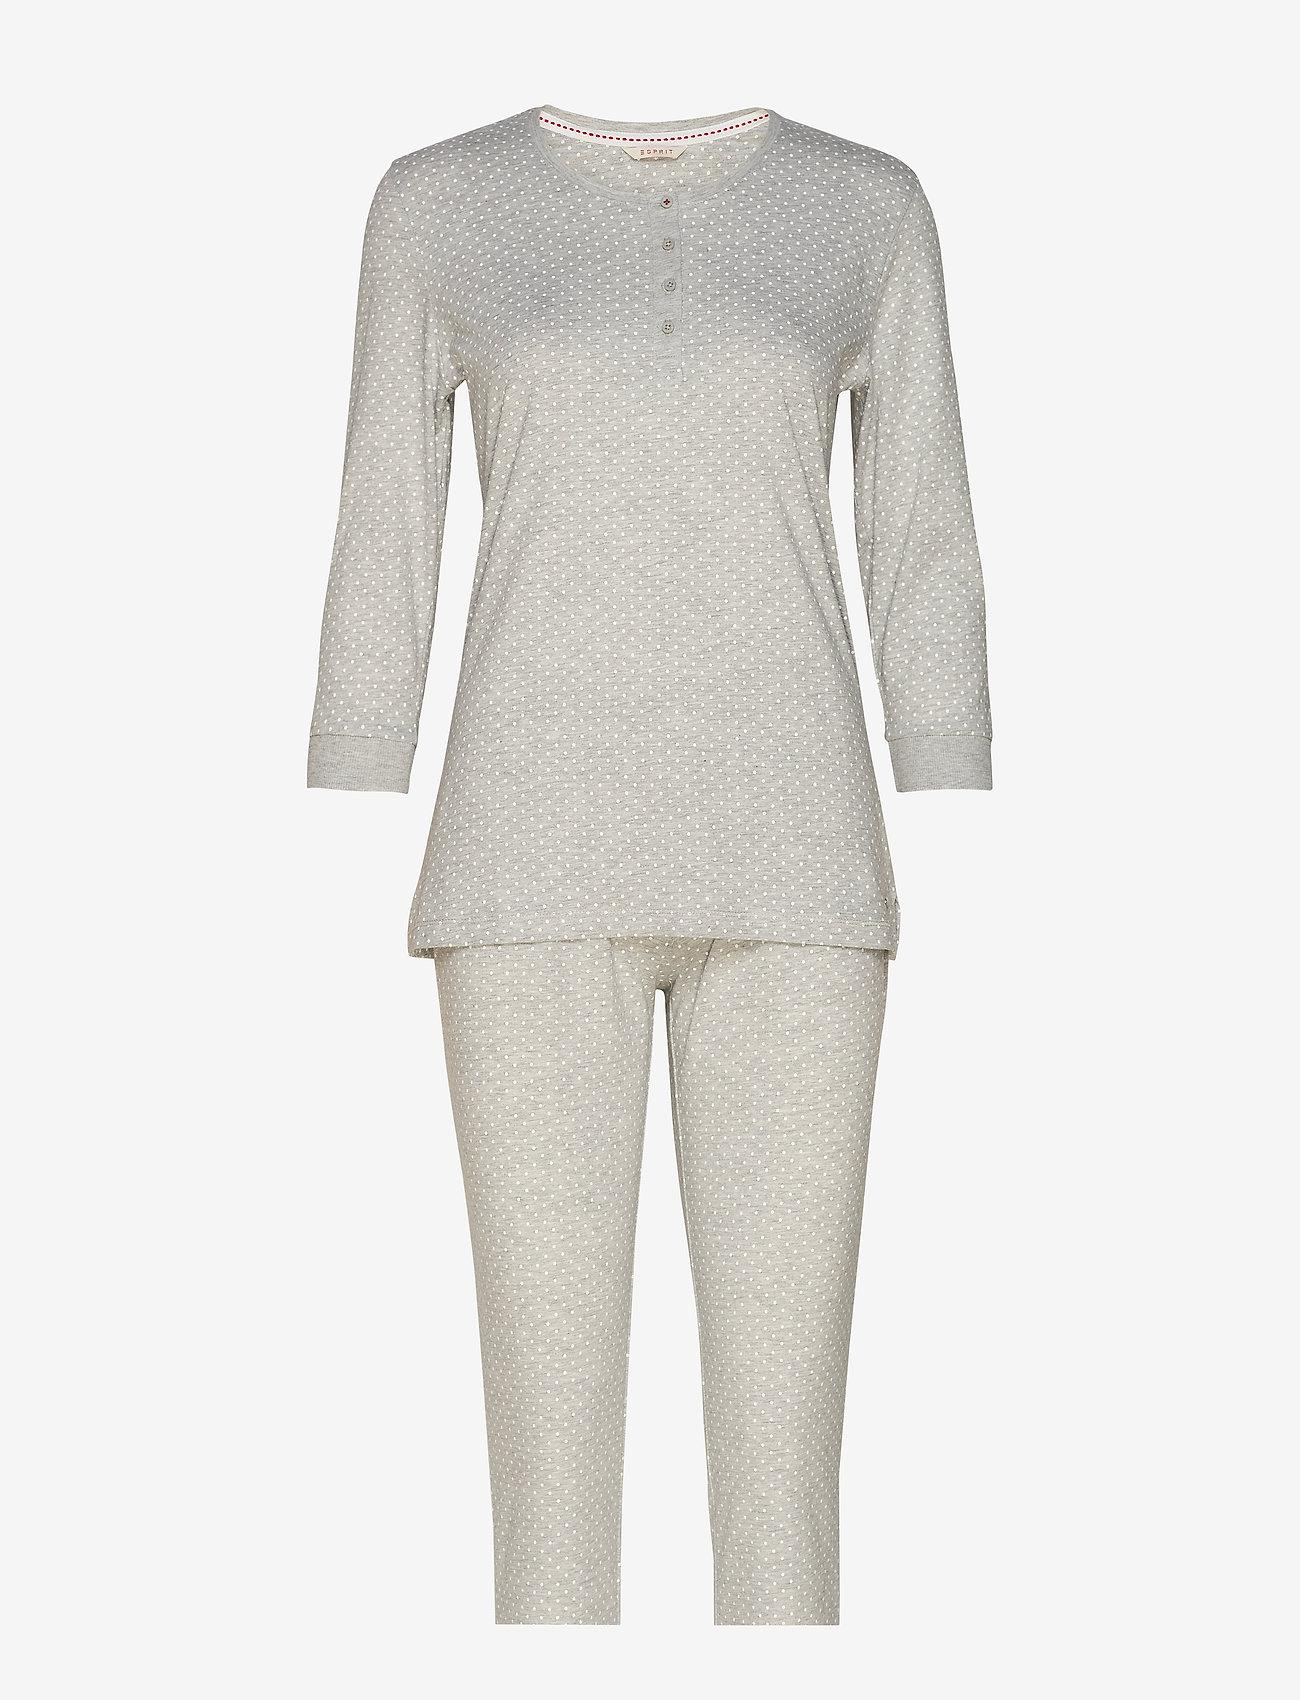 Esprit Bodywear Women - Pyjamas - pyjama''s - light grey - 0